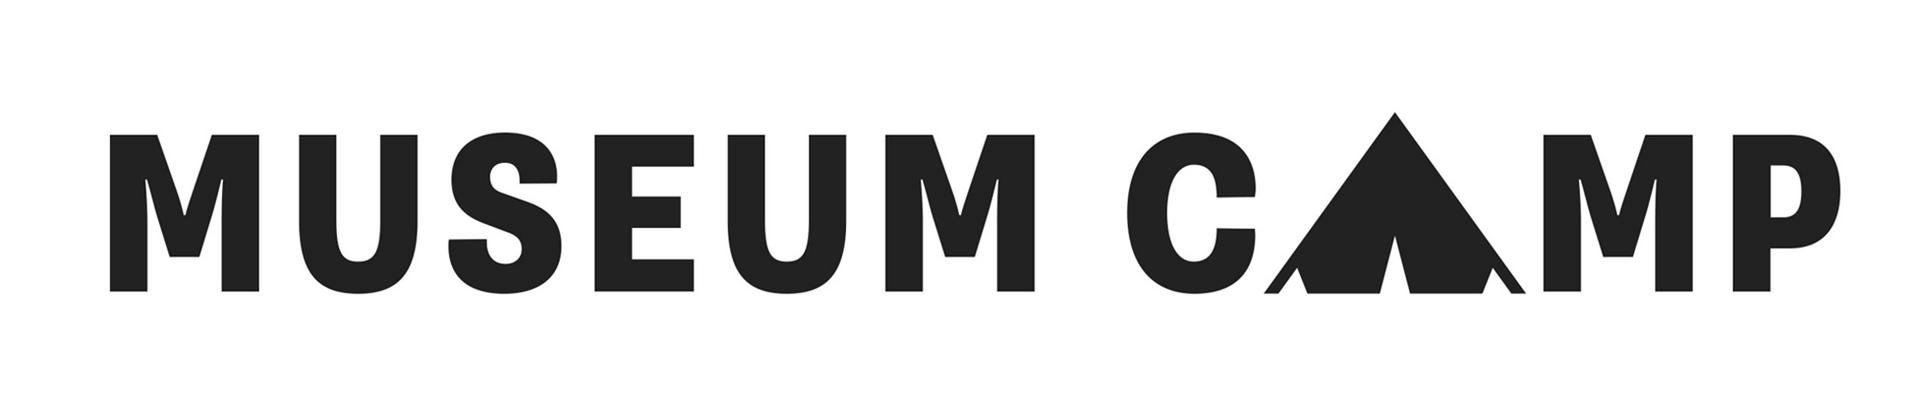 MuseumCamp Amsterdam 2018